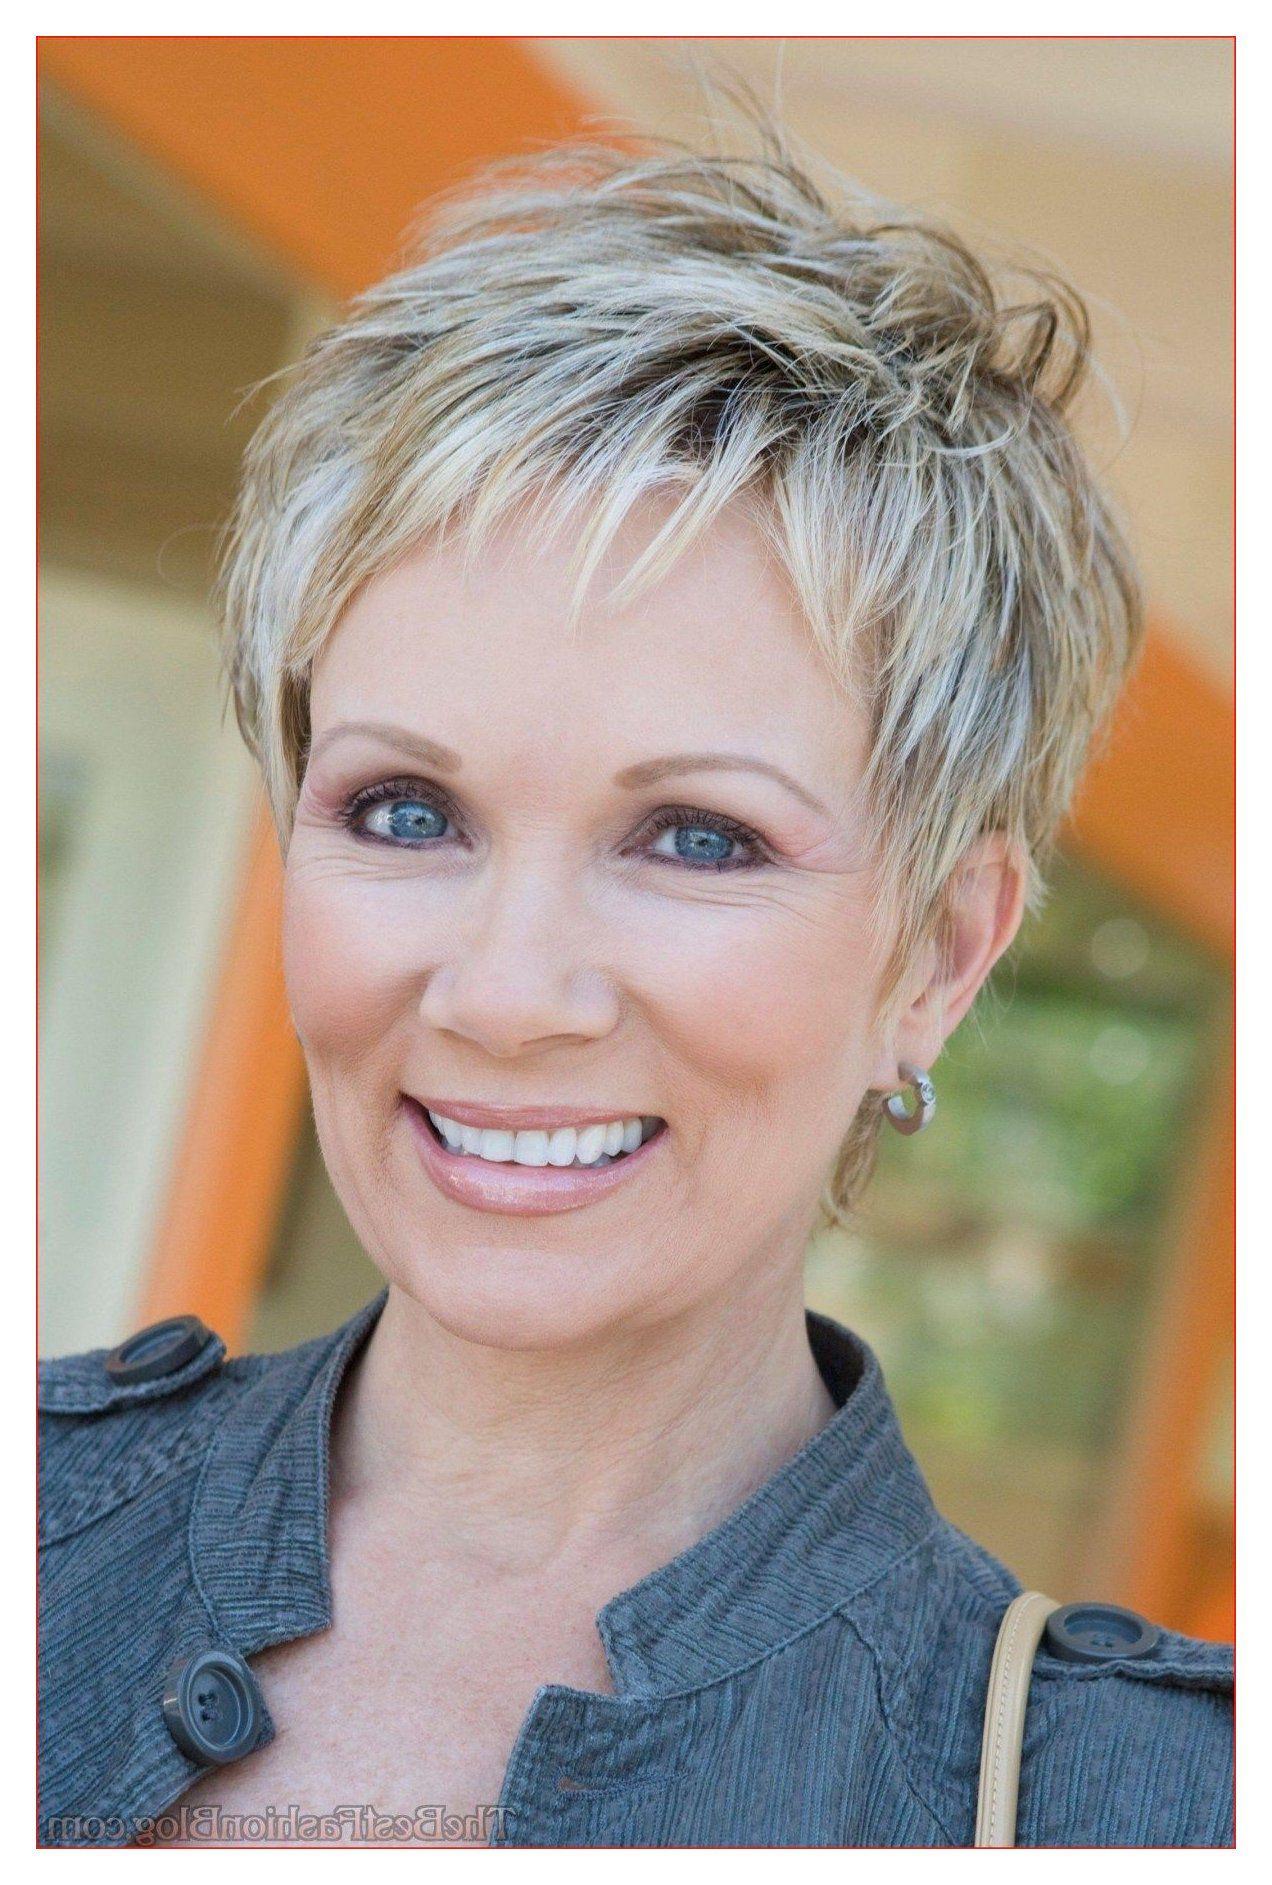 22 Ideas Short Hairstyles Round Face Over 60 Short Hairstyles For Thick Hair Round Face Over In 2020 Short Sassy Haircuts Short Hair Older Women Pixie Haircut